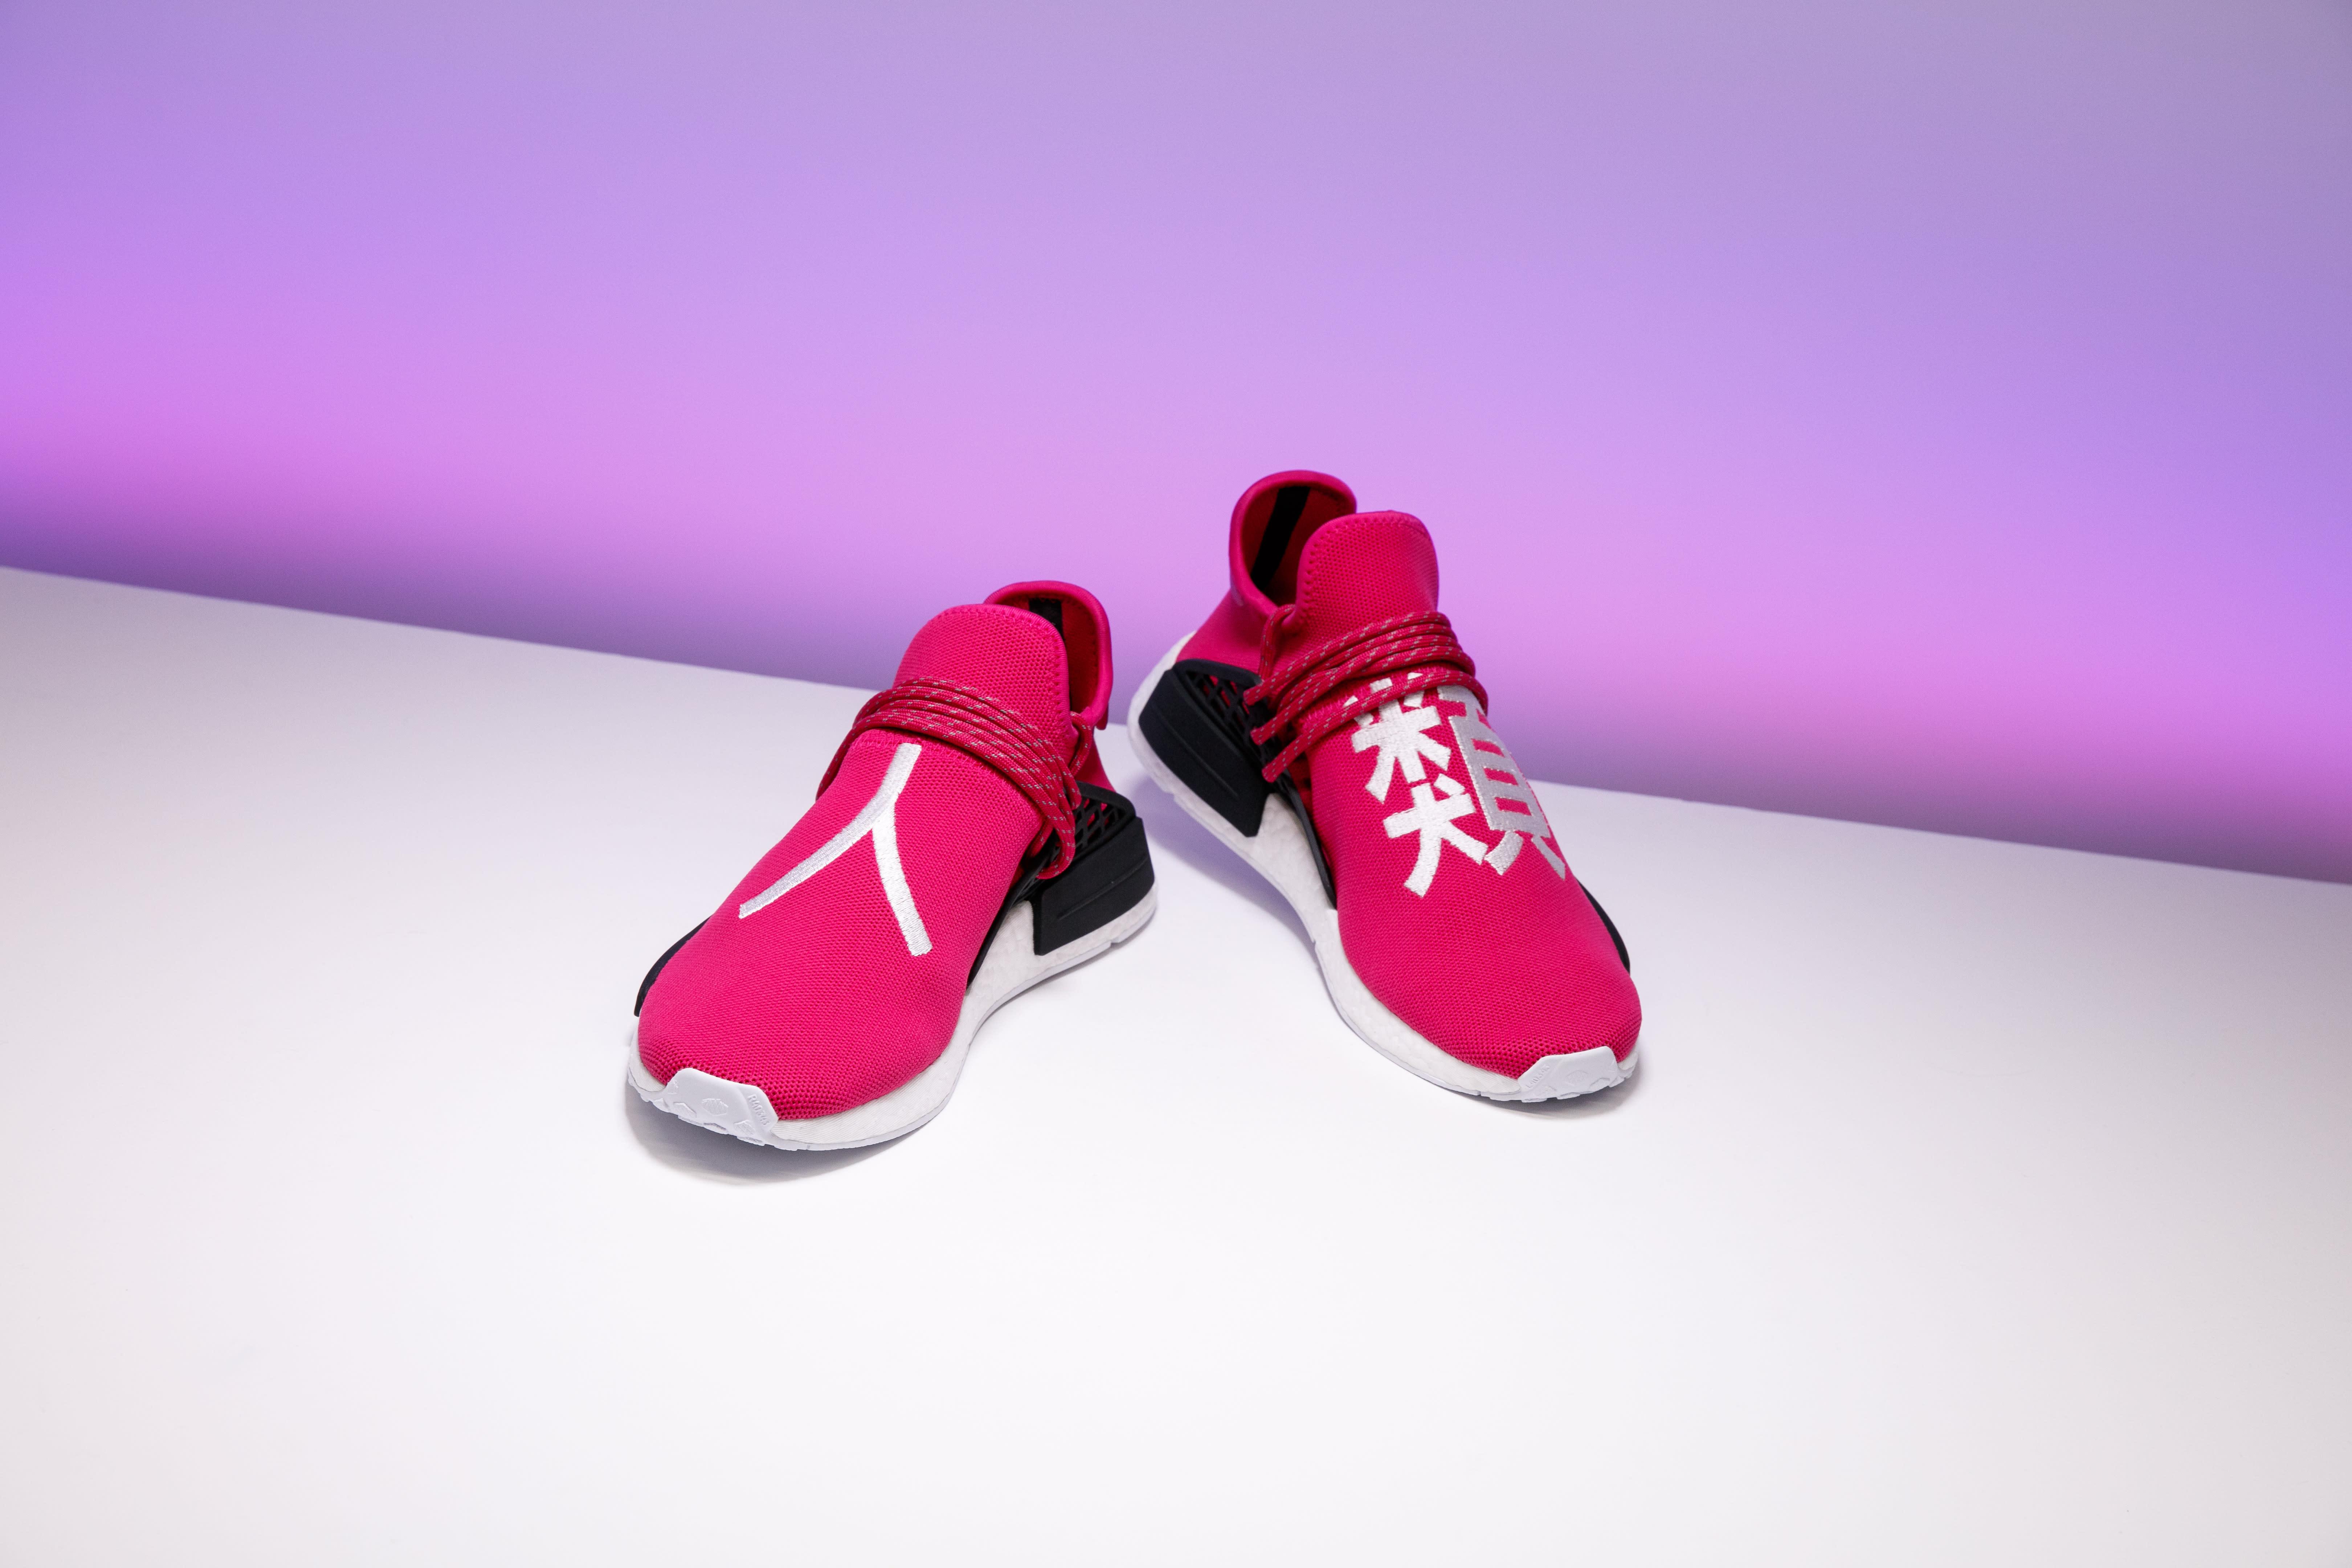 buy online 01803 8f45c NEW 2017 UA Adidas NMD Human Race Family friends